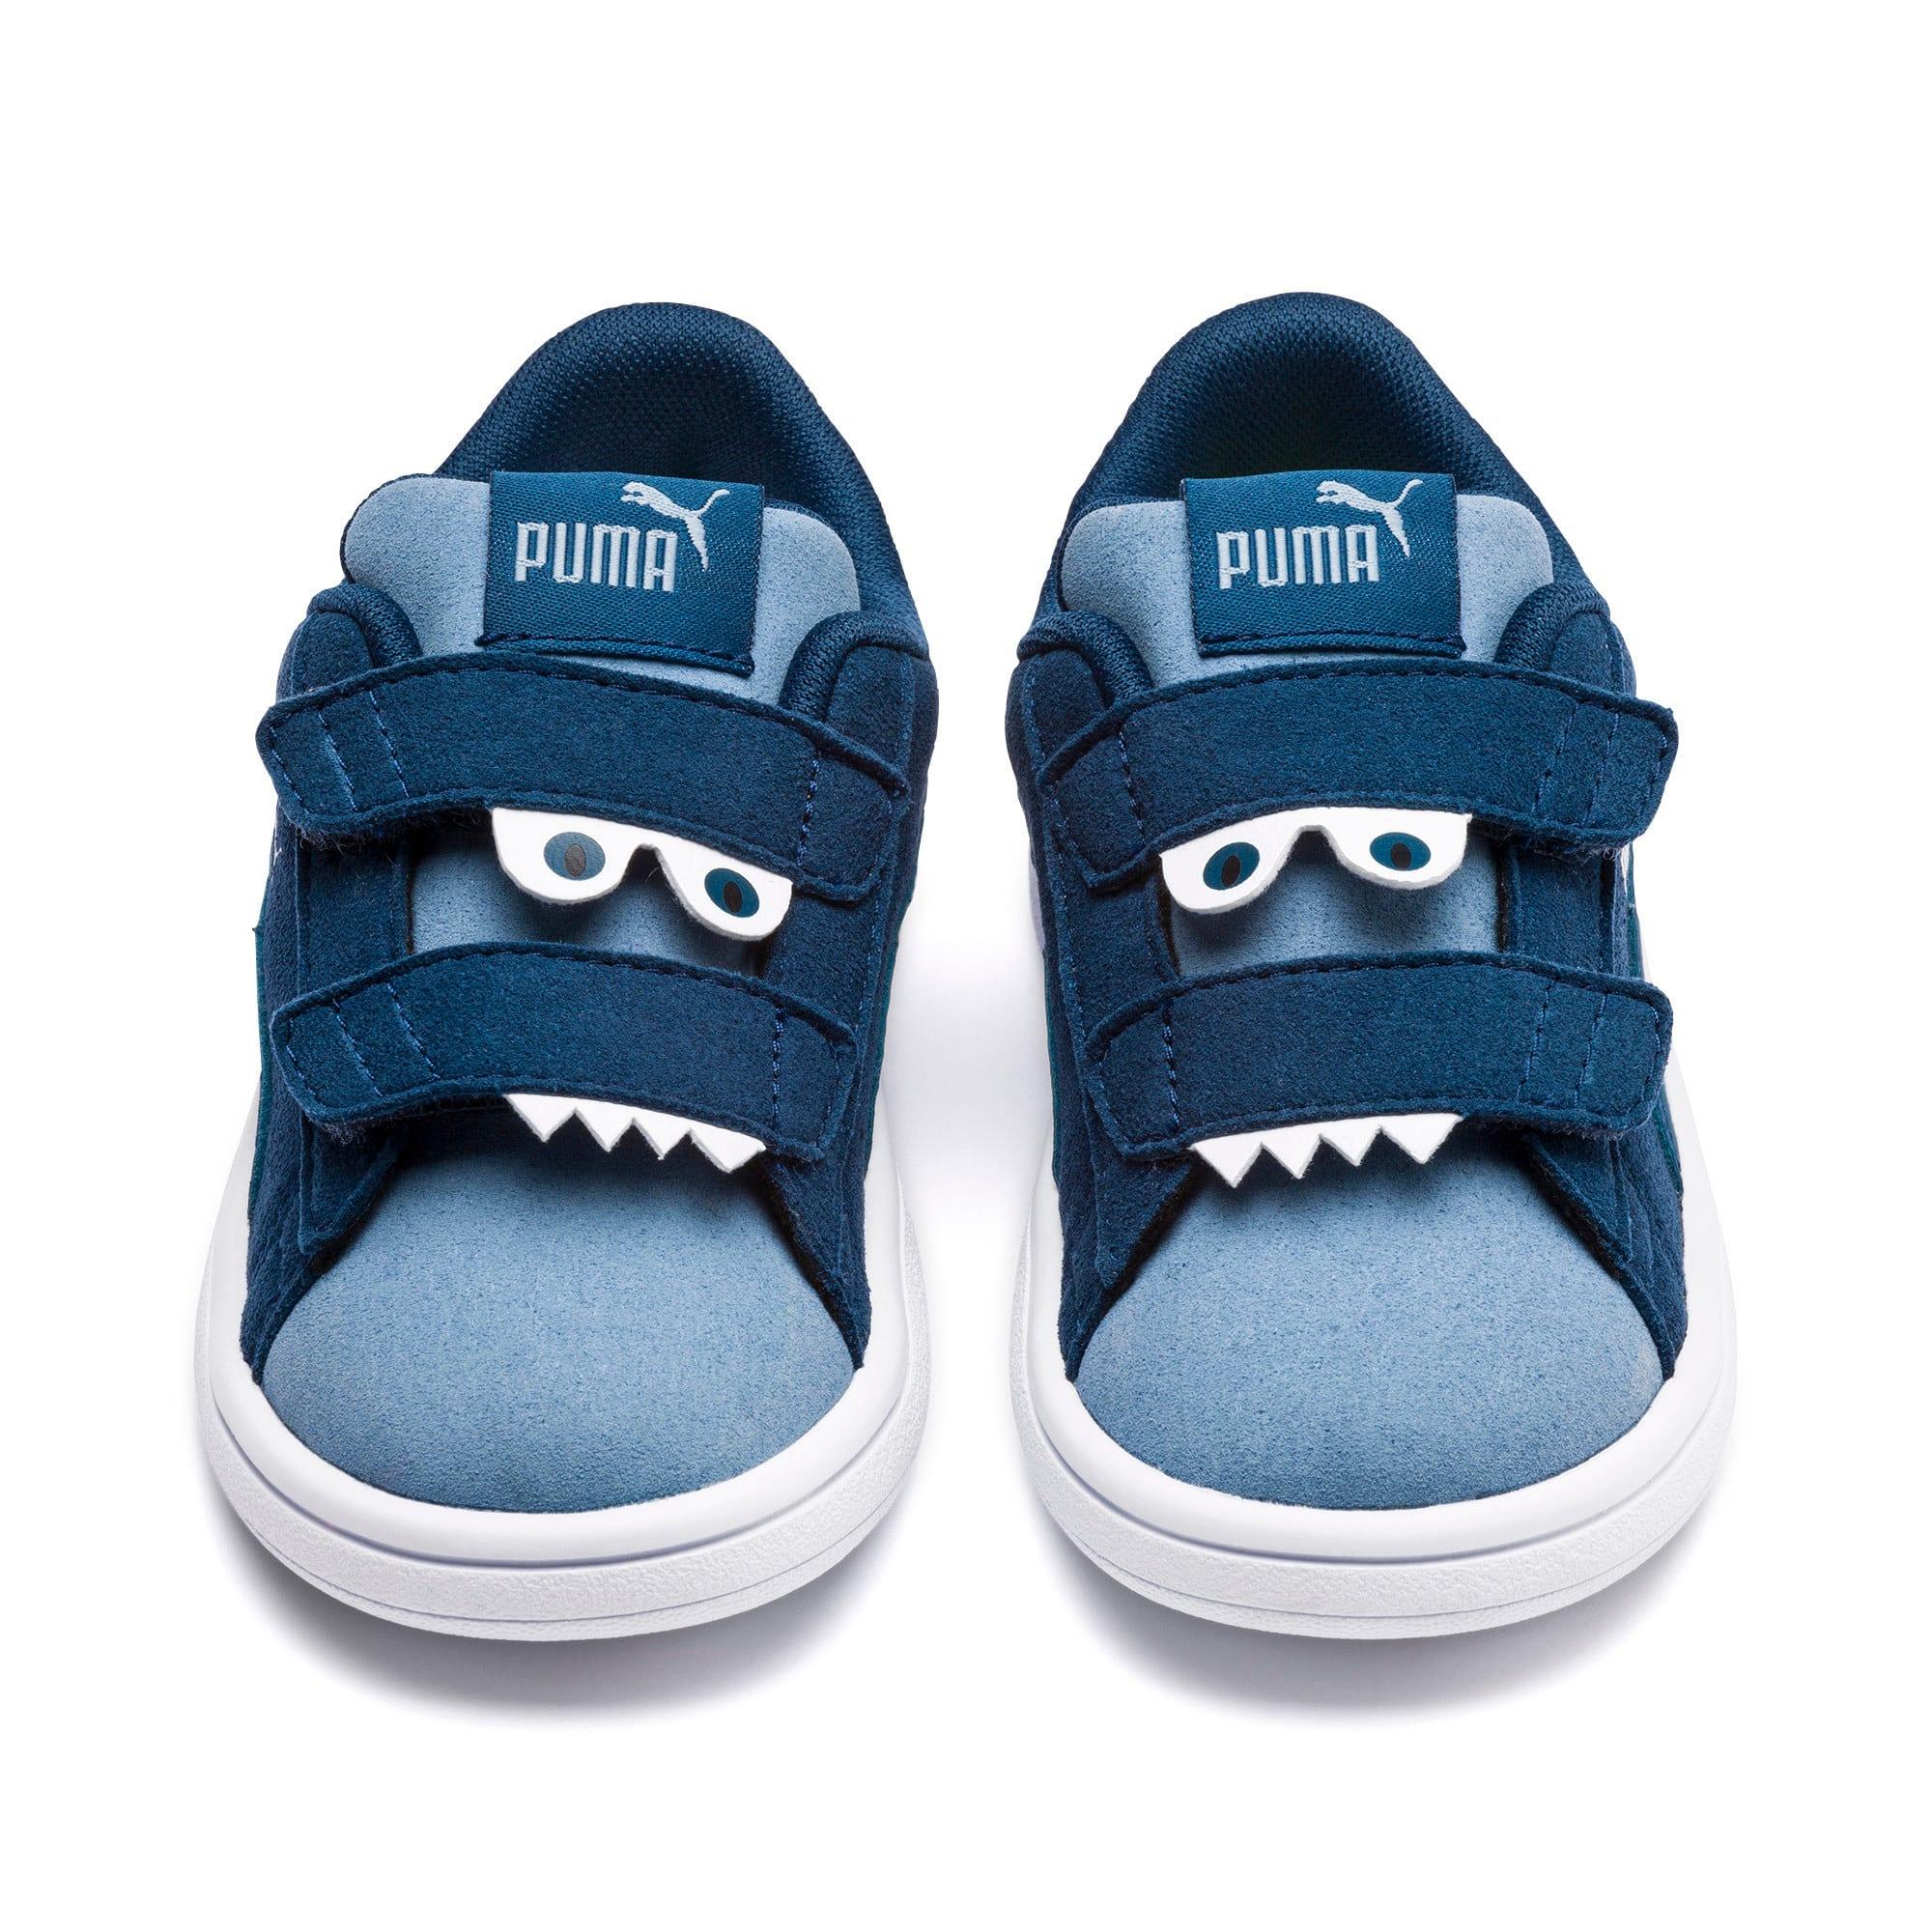 Thumbnail 2 of PUMA Smash v2 Monster Toddler Shoes, Gibraltar Sea-Faded Denim, medium